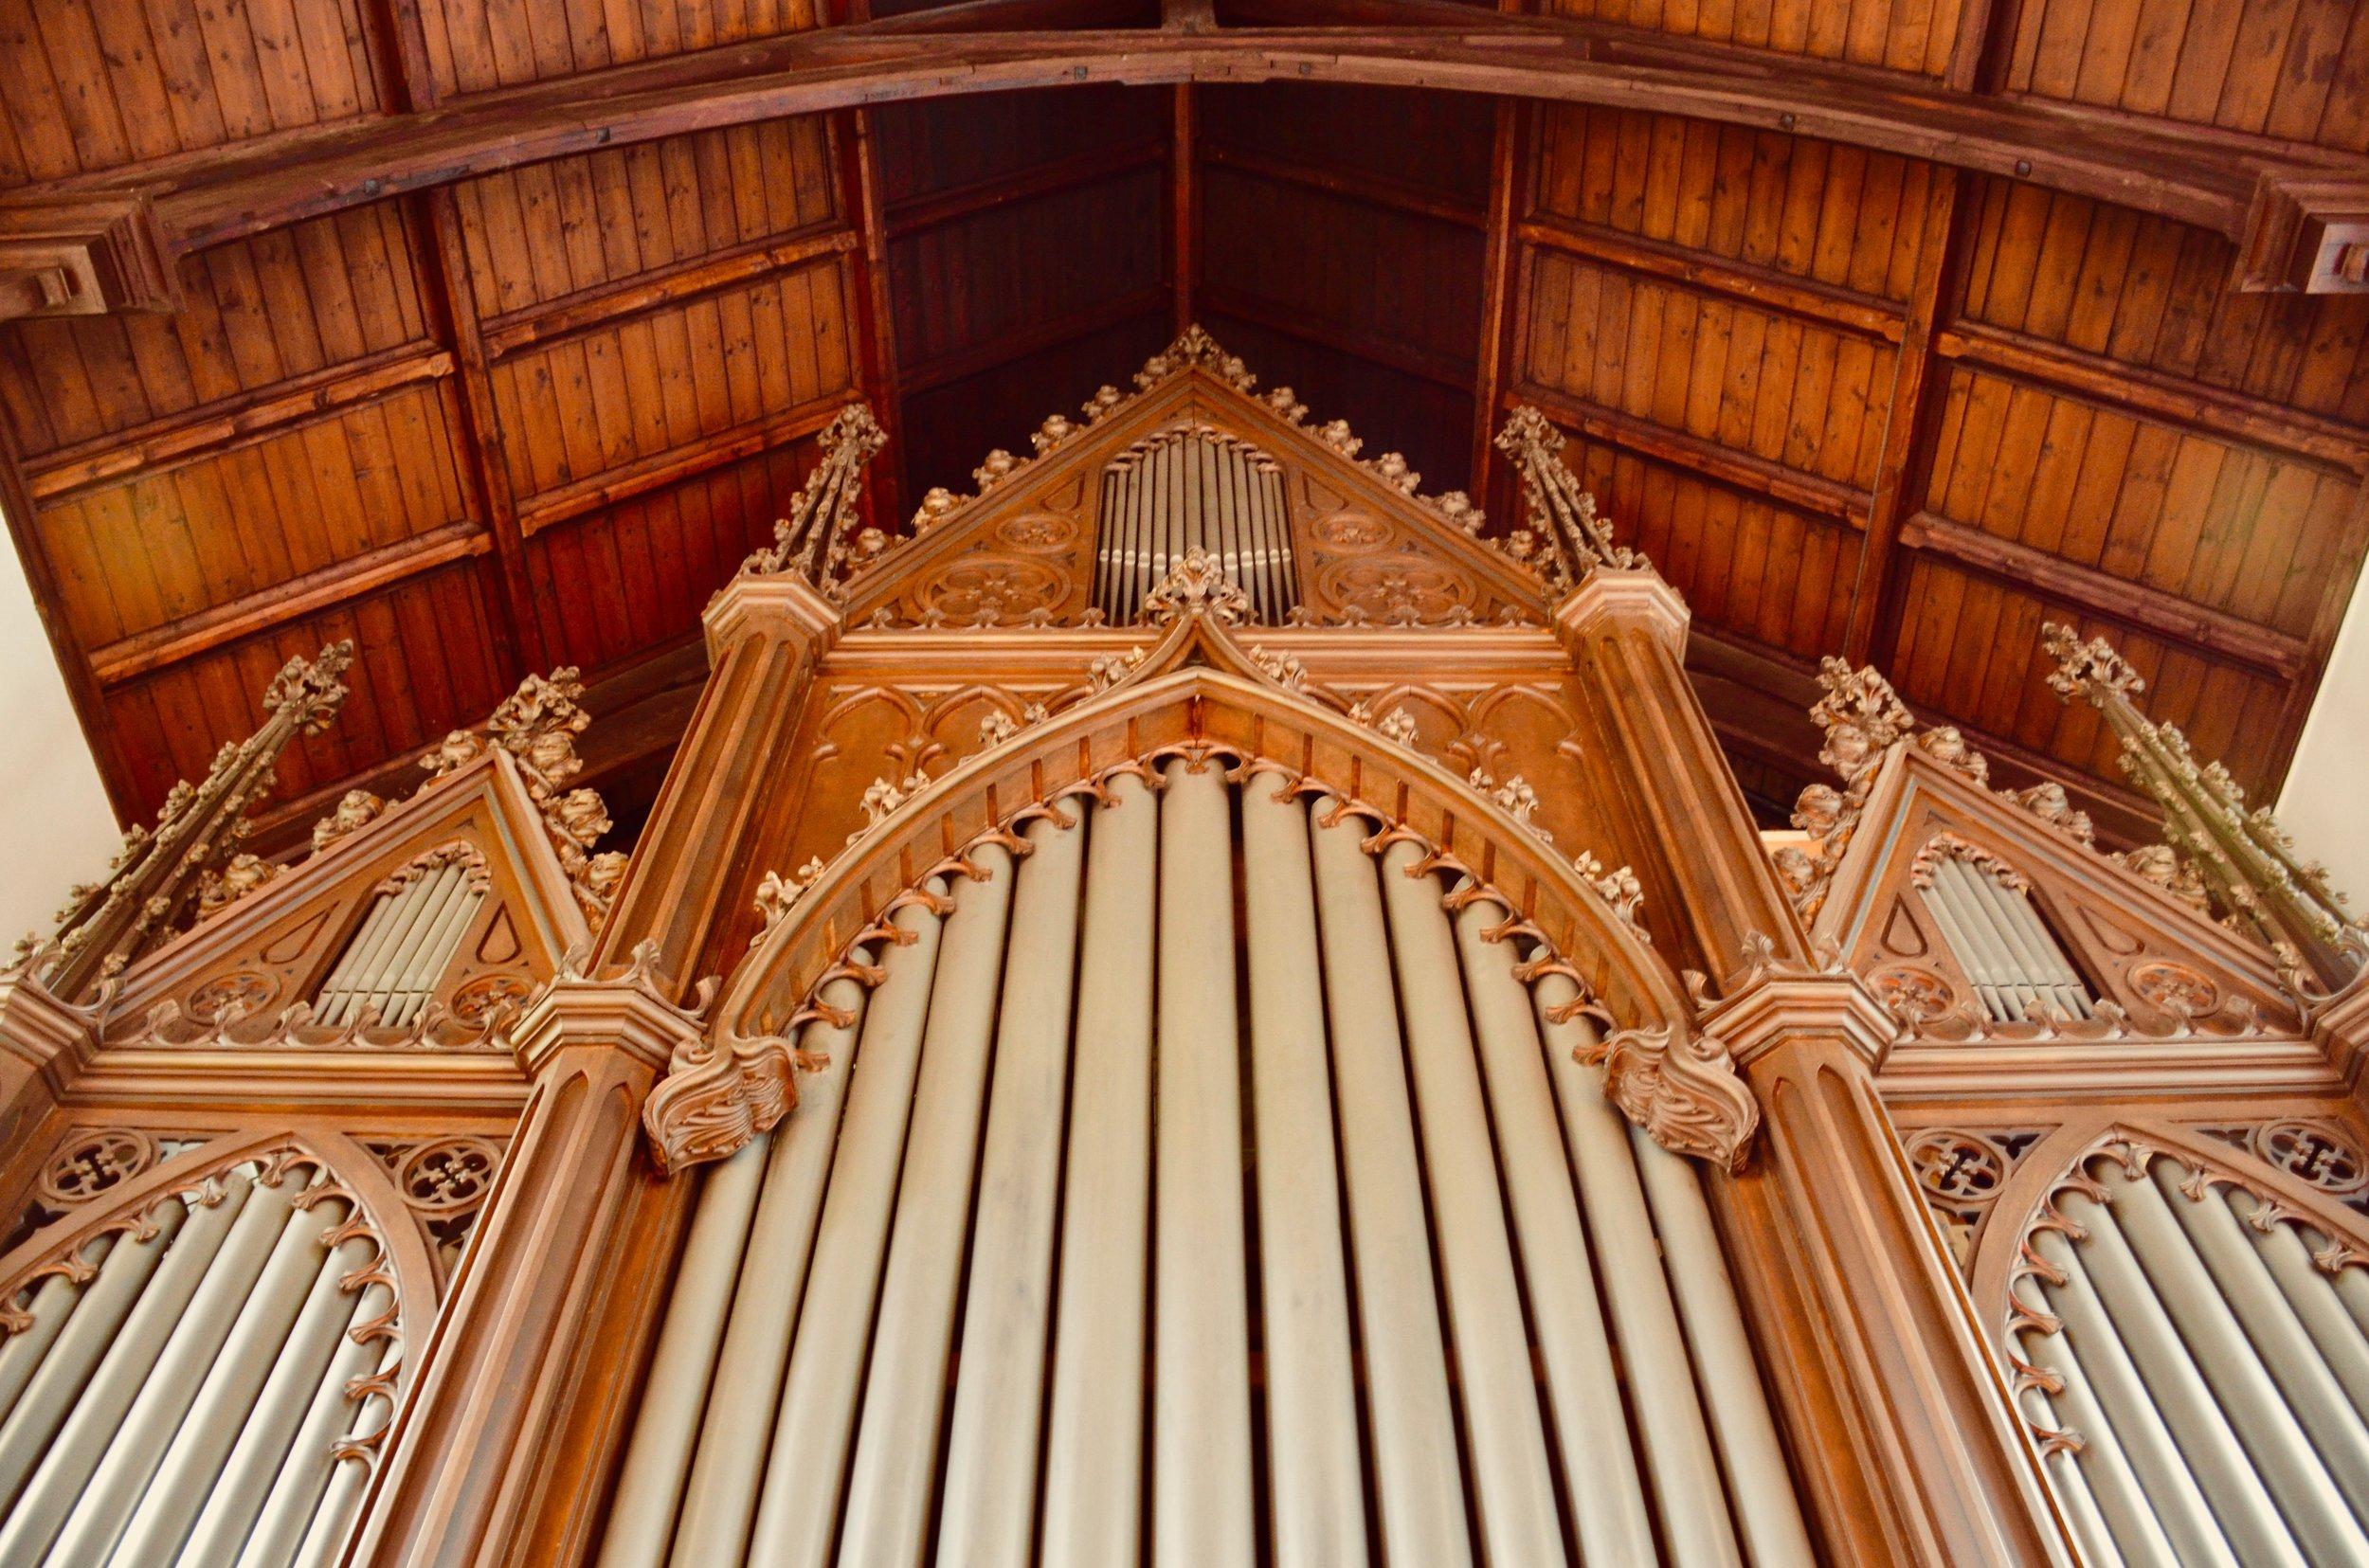 Façade detail, 1861 Marcussen & Søn organ in Haga Church, Göteborg, Sweden.